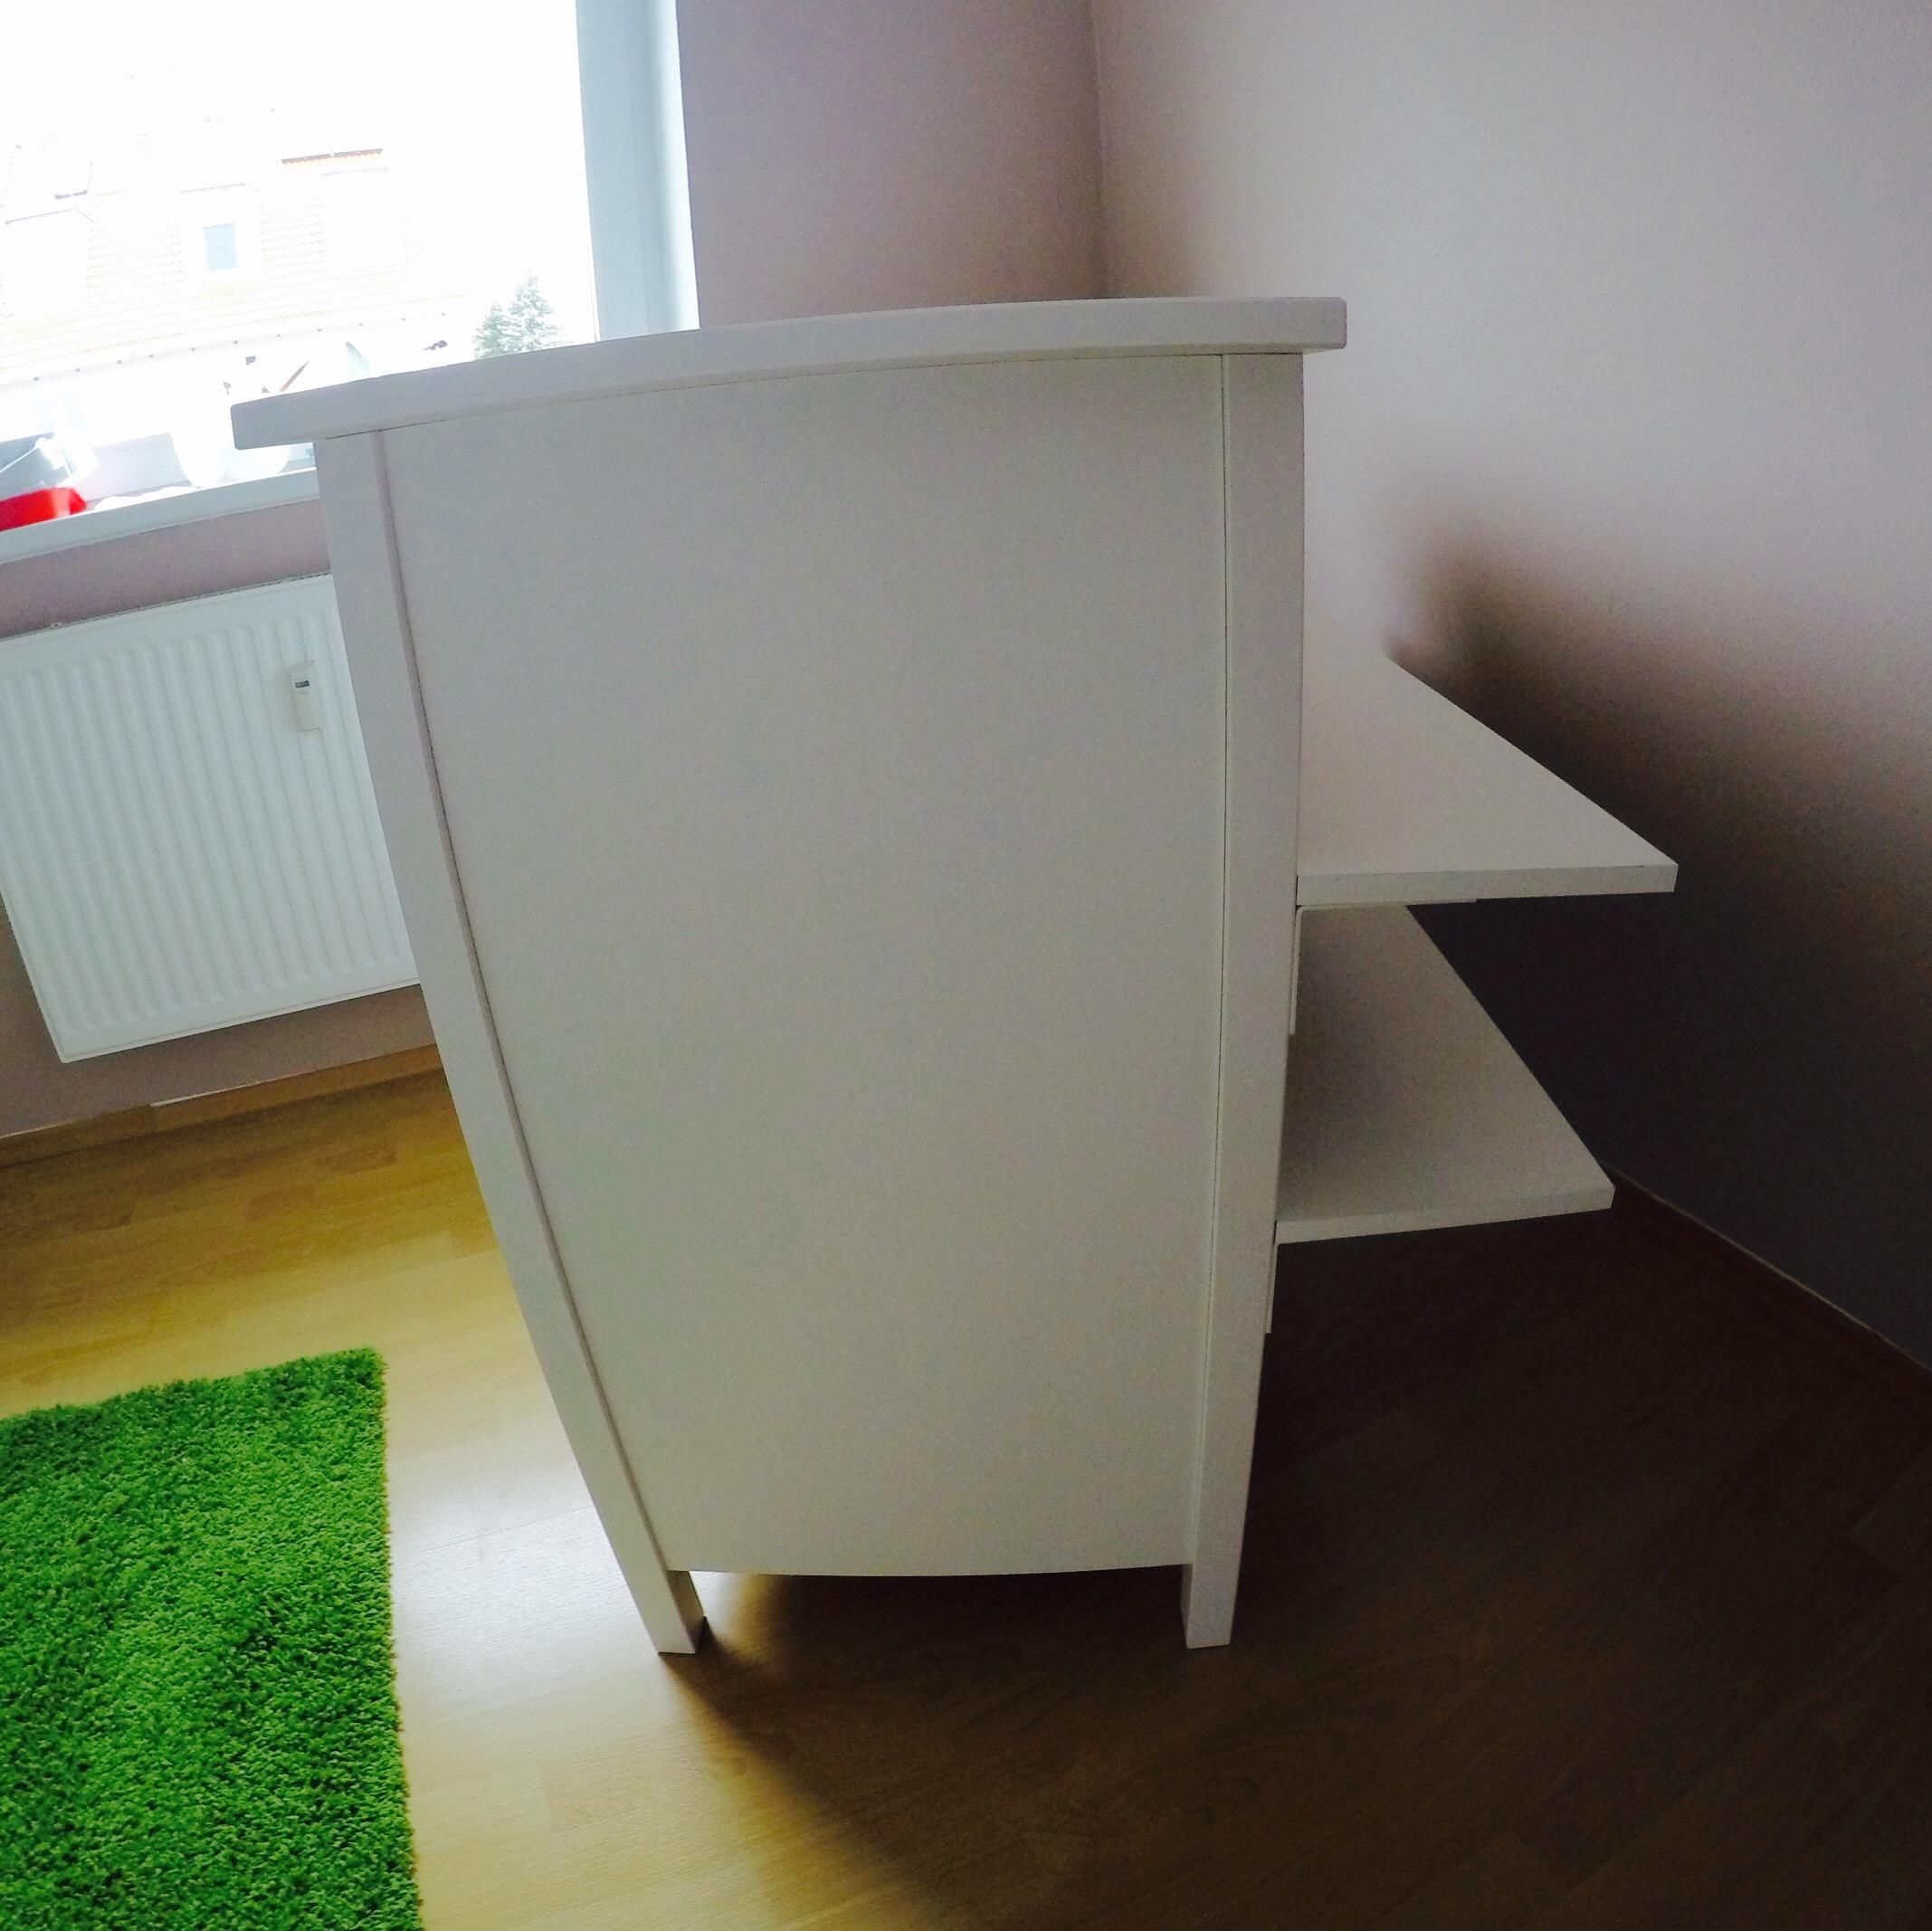 wickeltisch pimp your hemnes wickelchef. Black Bedroom Furniture Sets. Home Design Ideas